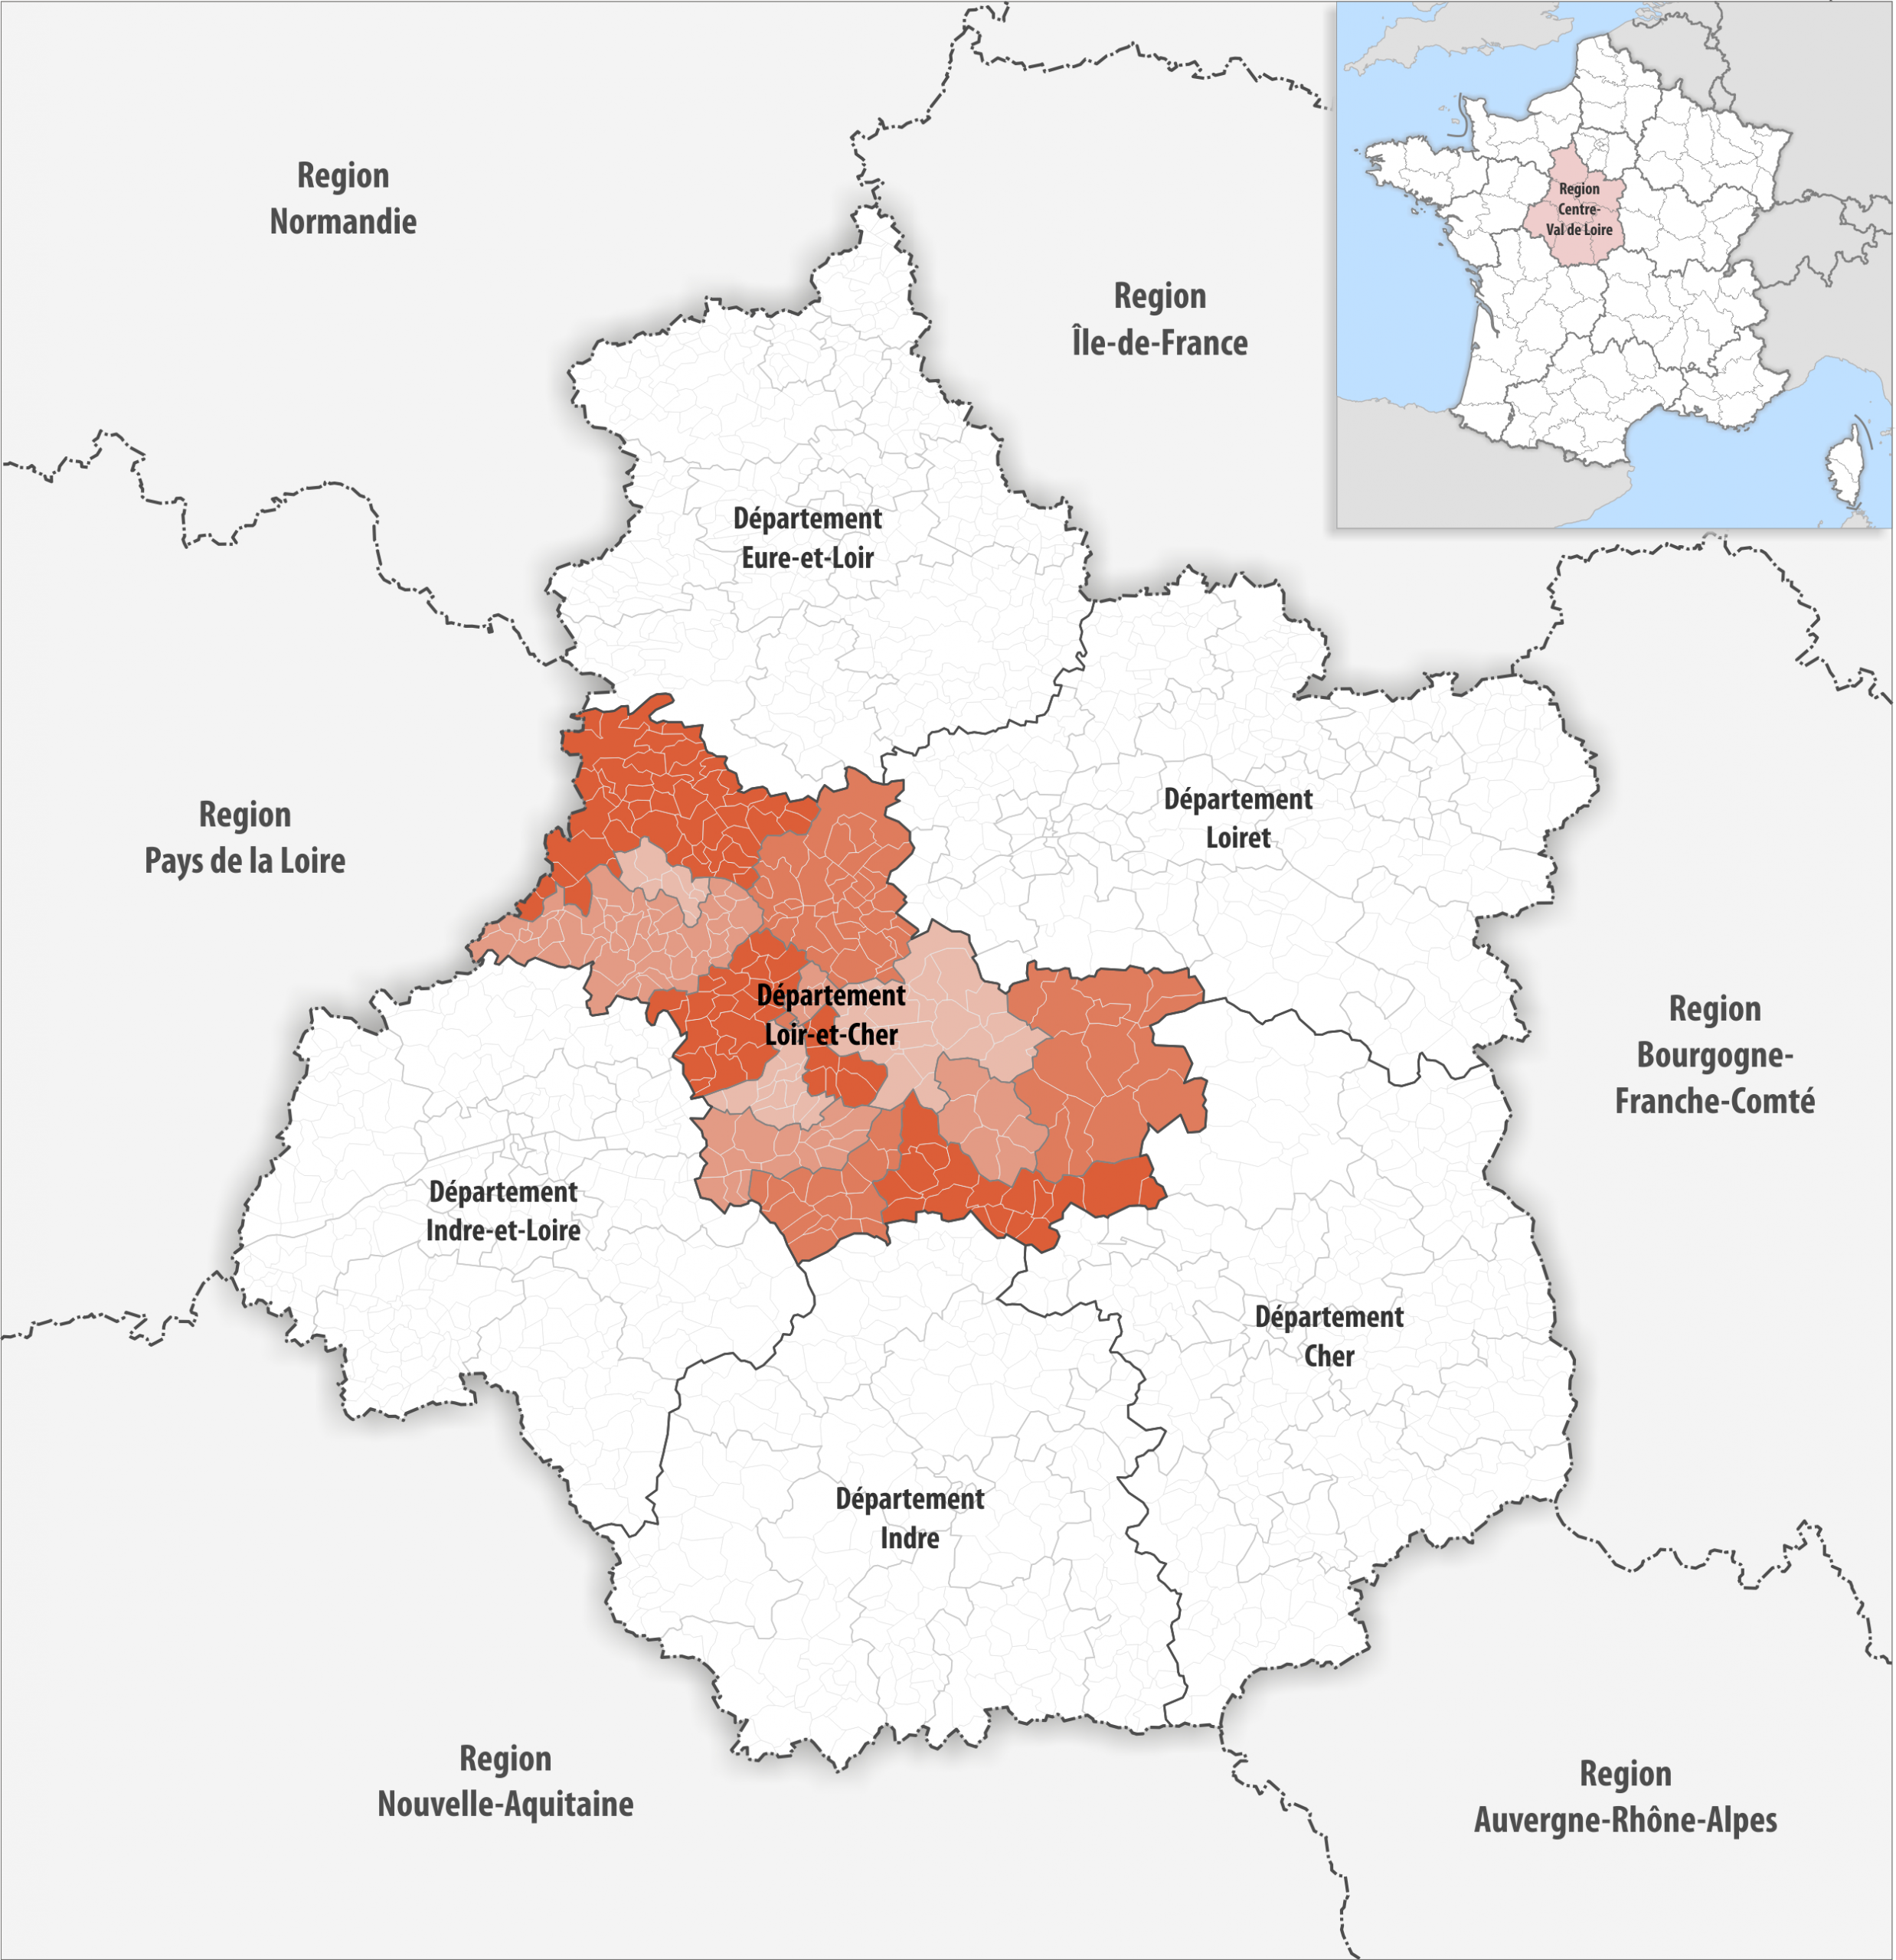 File:locator Map Of Departement Loir-Et-Cher 2018 concernant Departement 22 Region